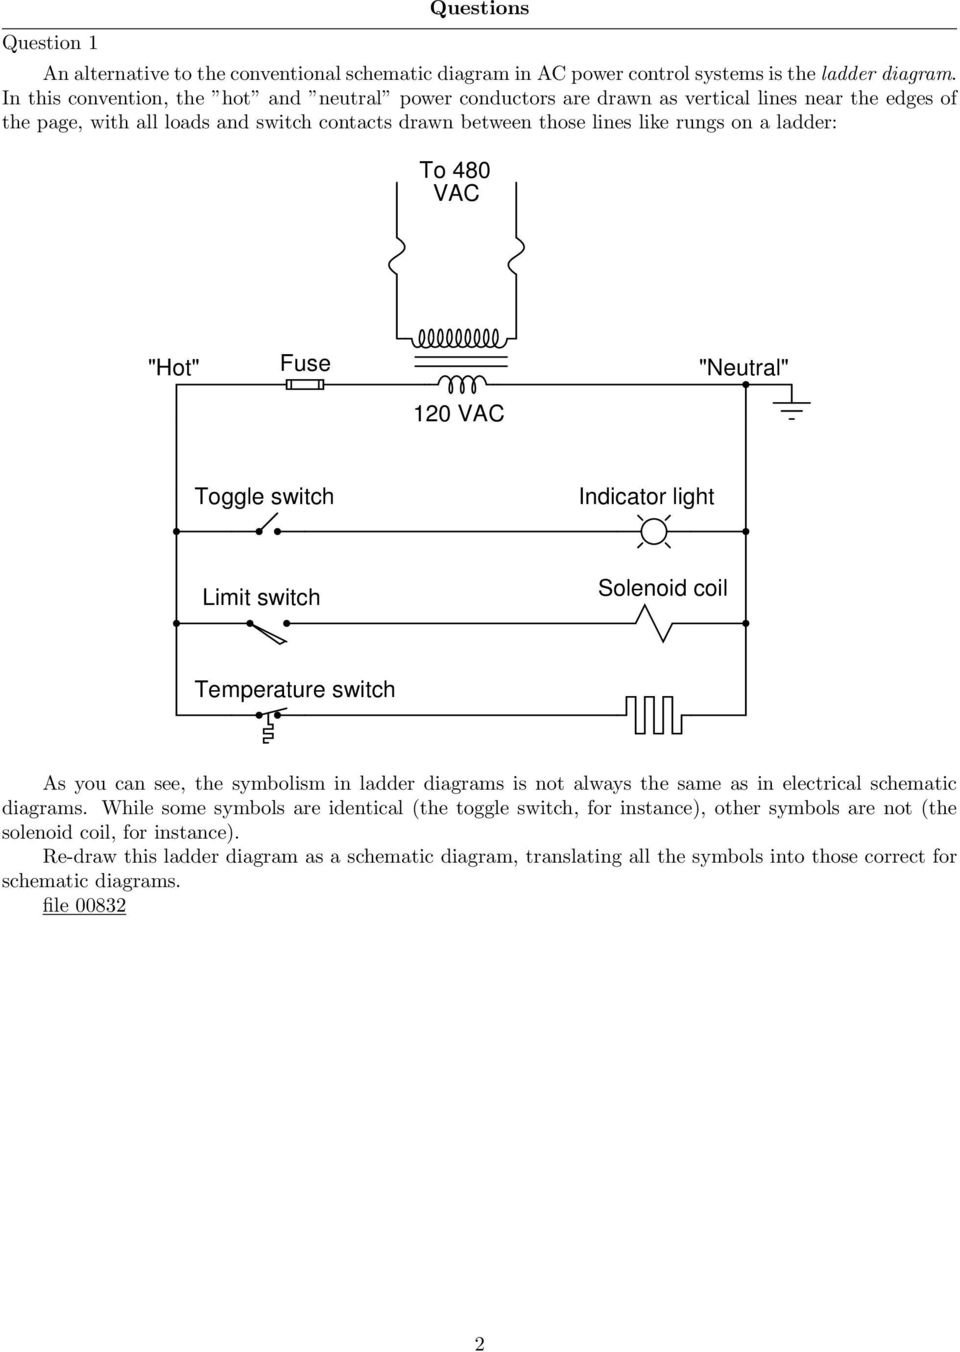 medium resolution of to 480 vac hot fuse neutral 120 vac toggle switch indicator light